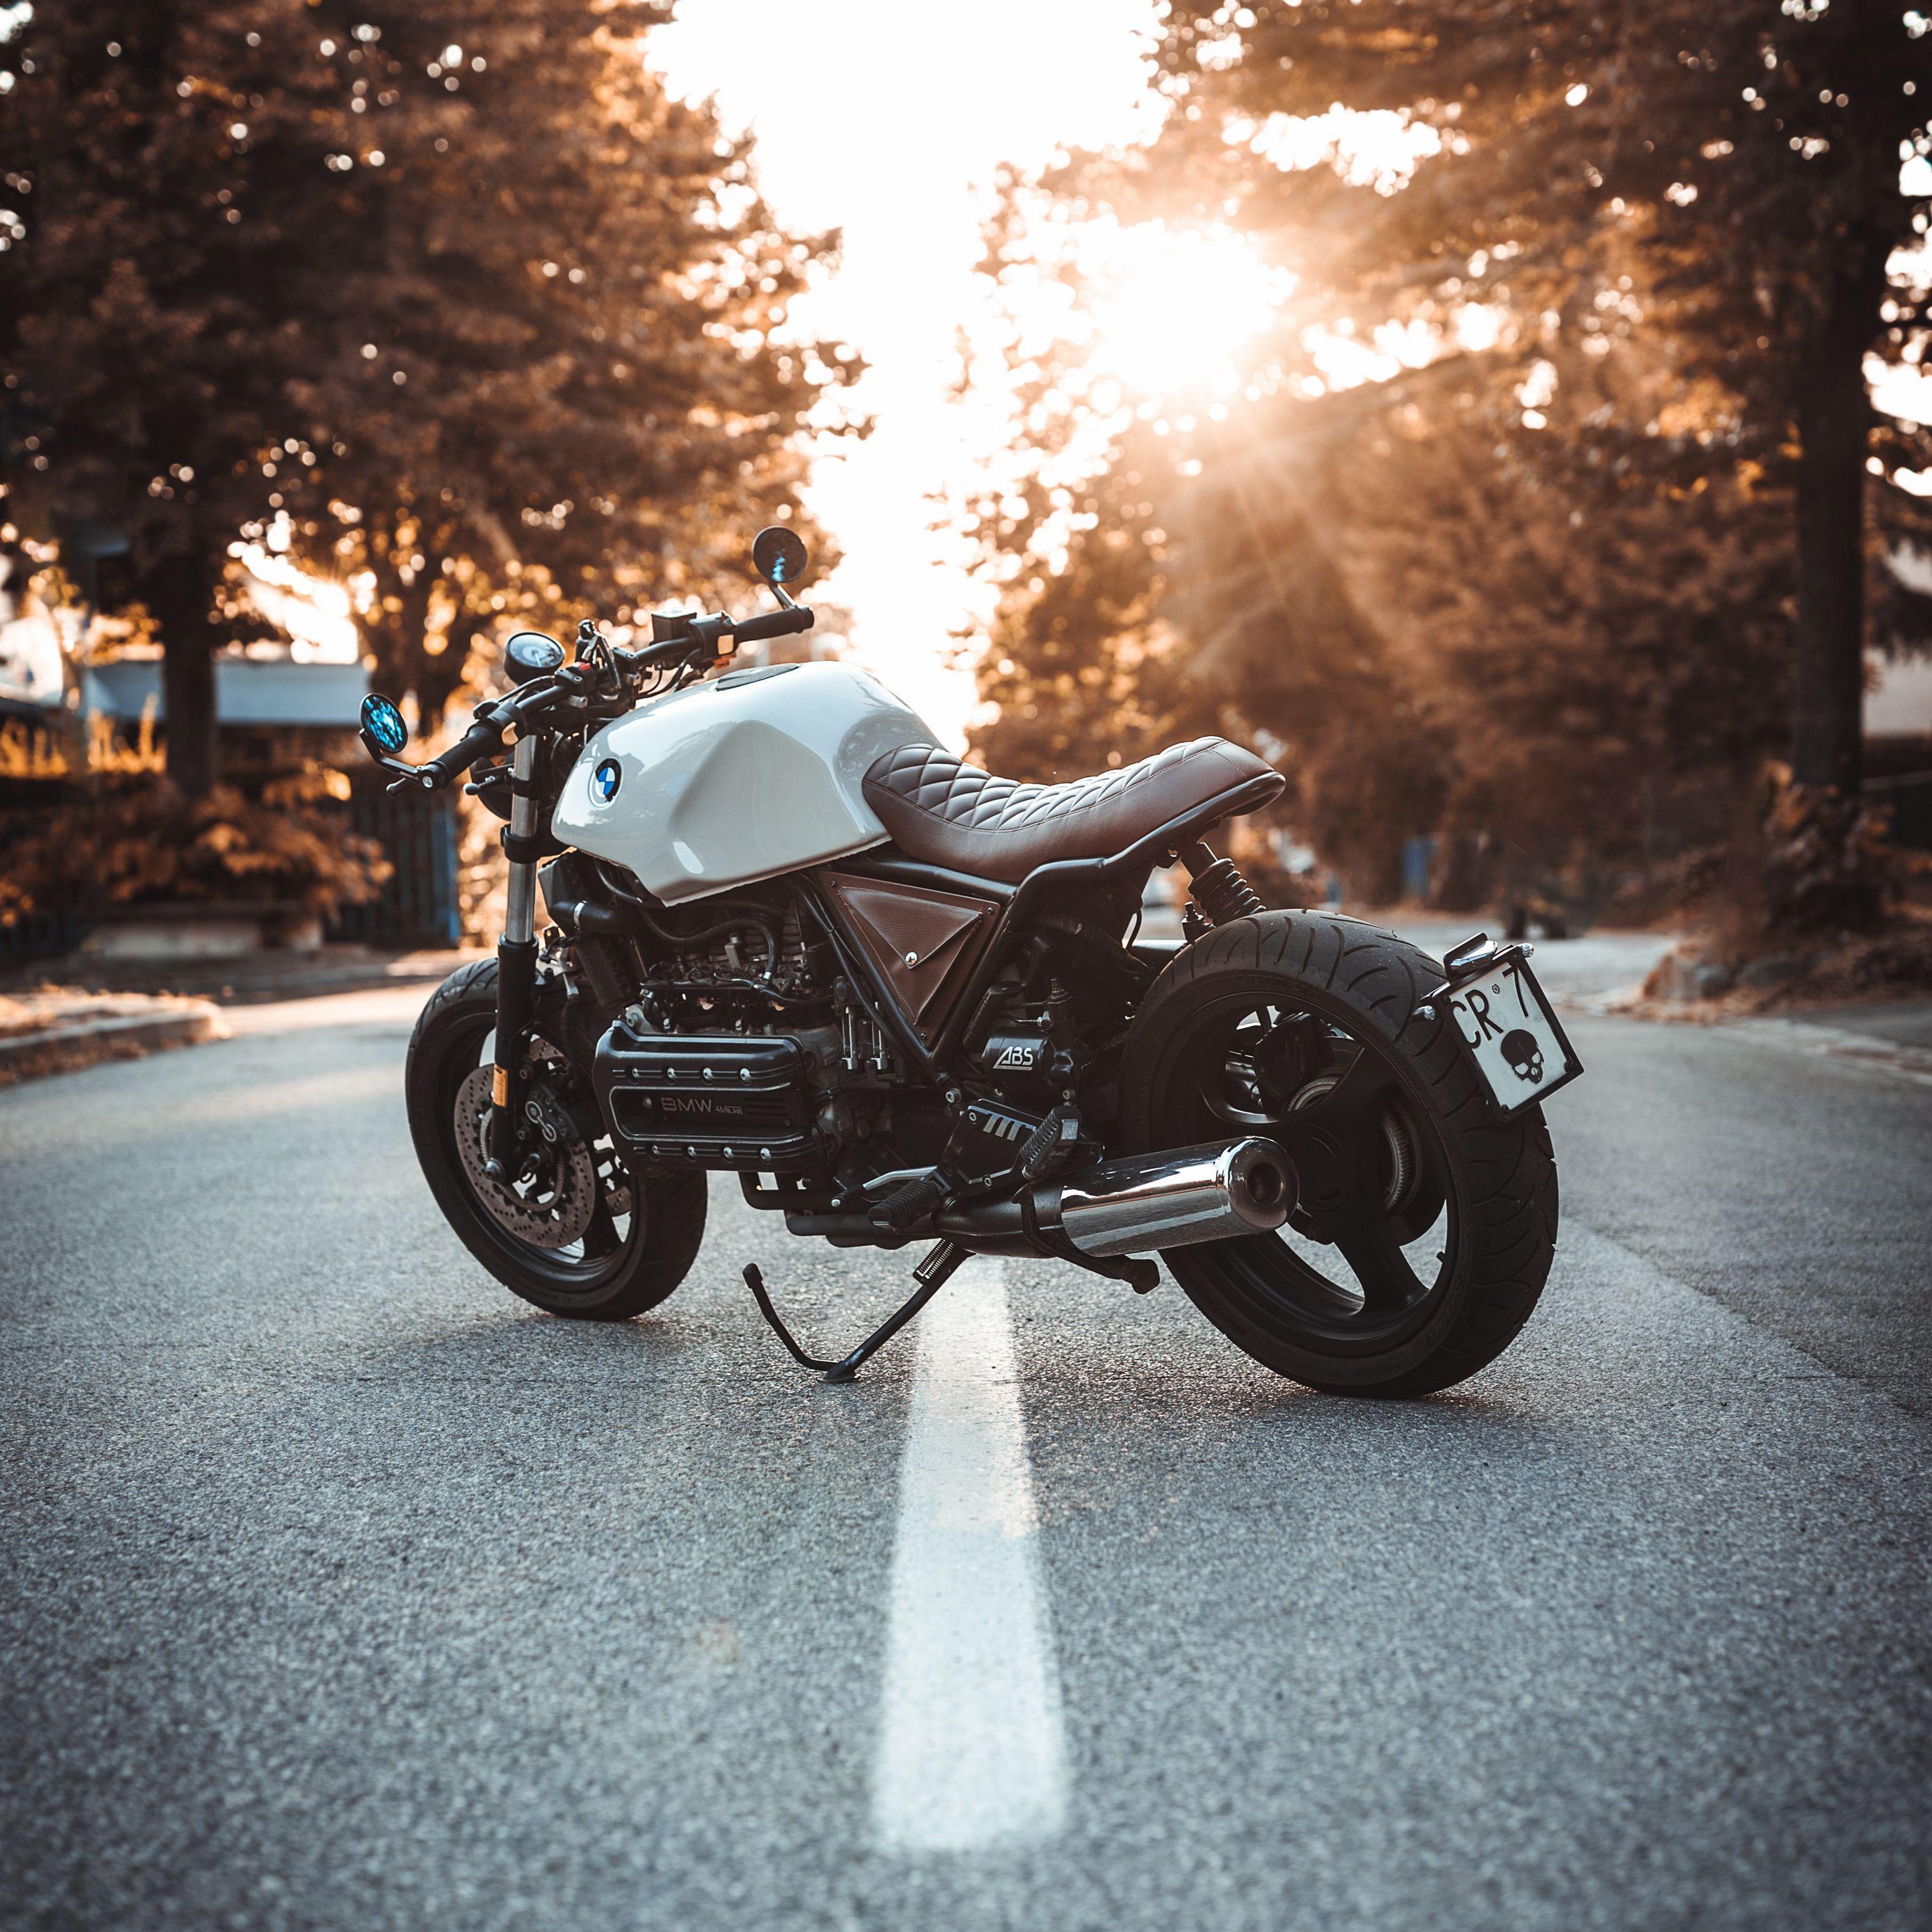 2780x2780 Обои bmw k100, мотоцикл, байк, вид сбоку